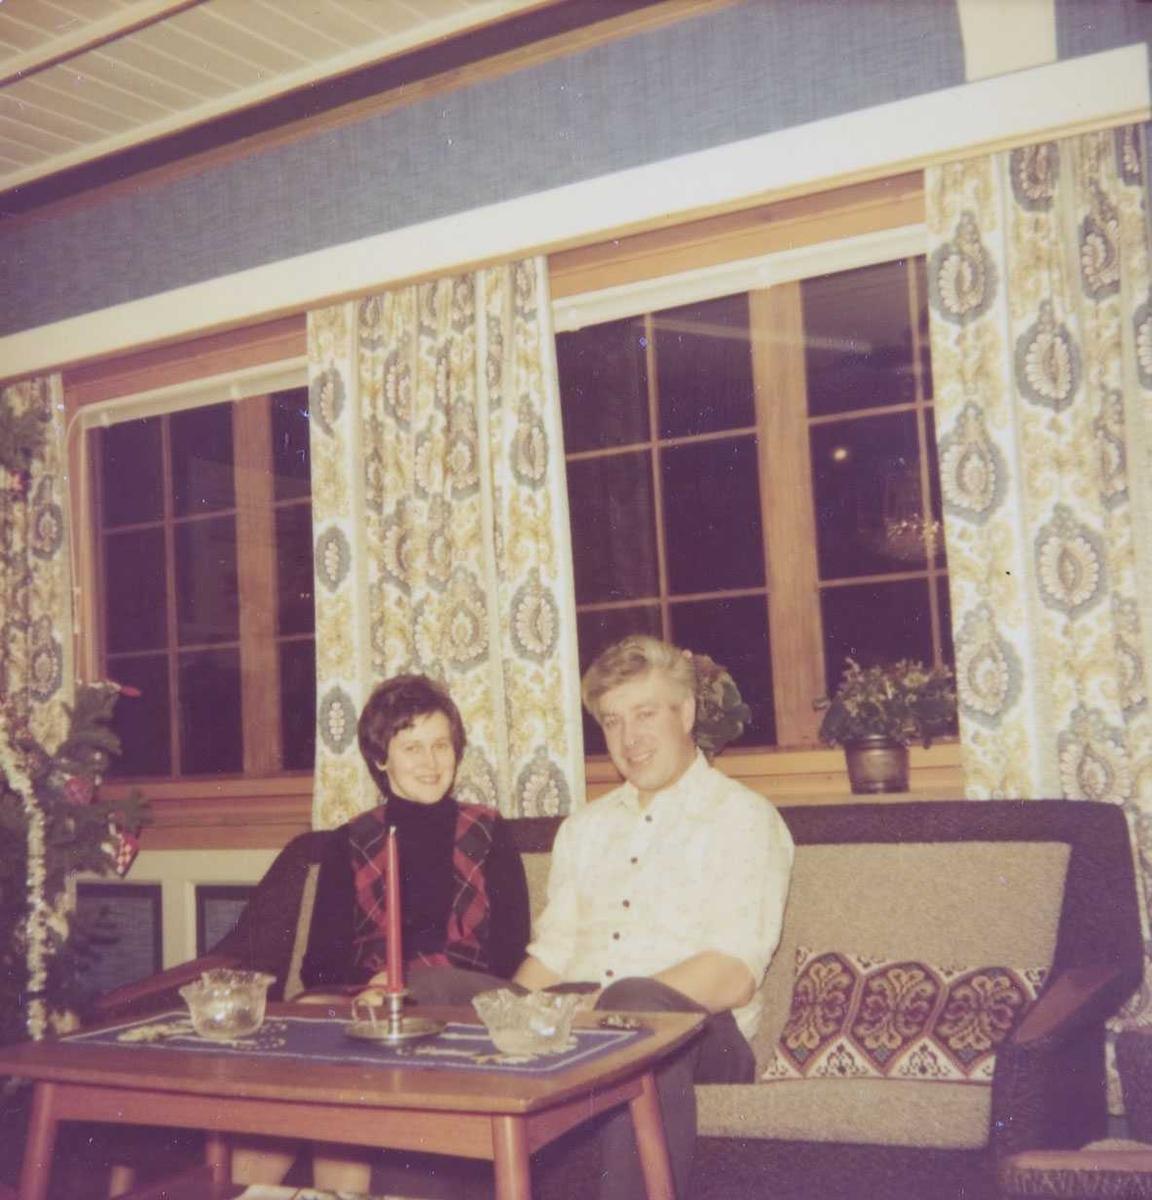 Bonden og kona i sofaen ca. 1975